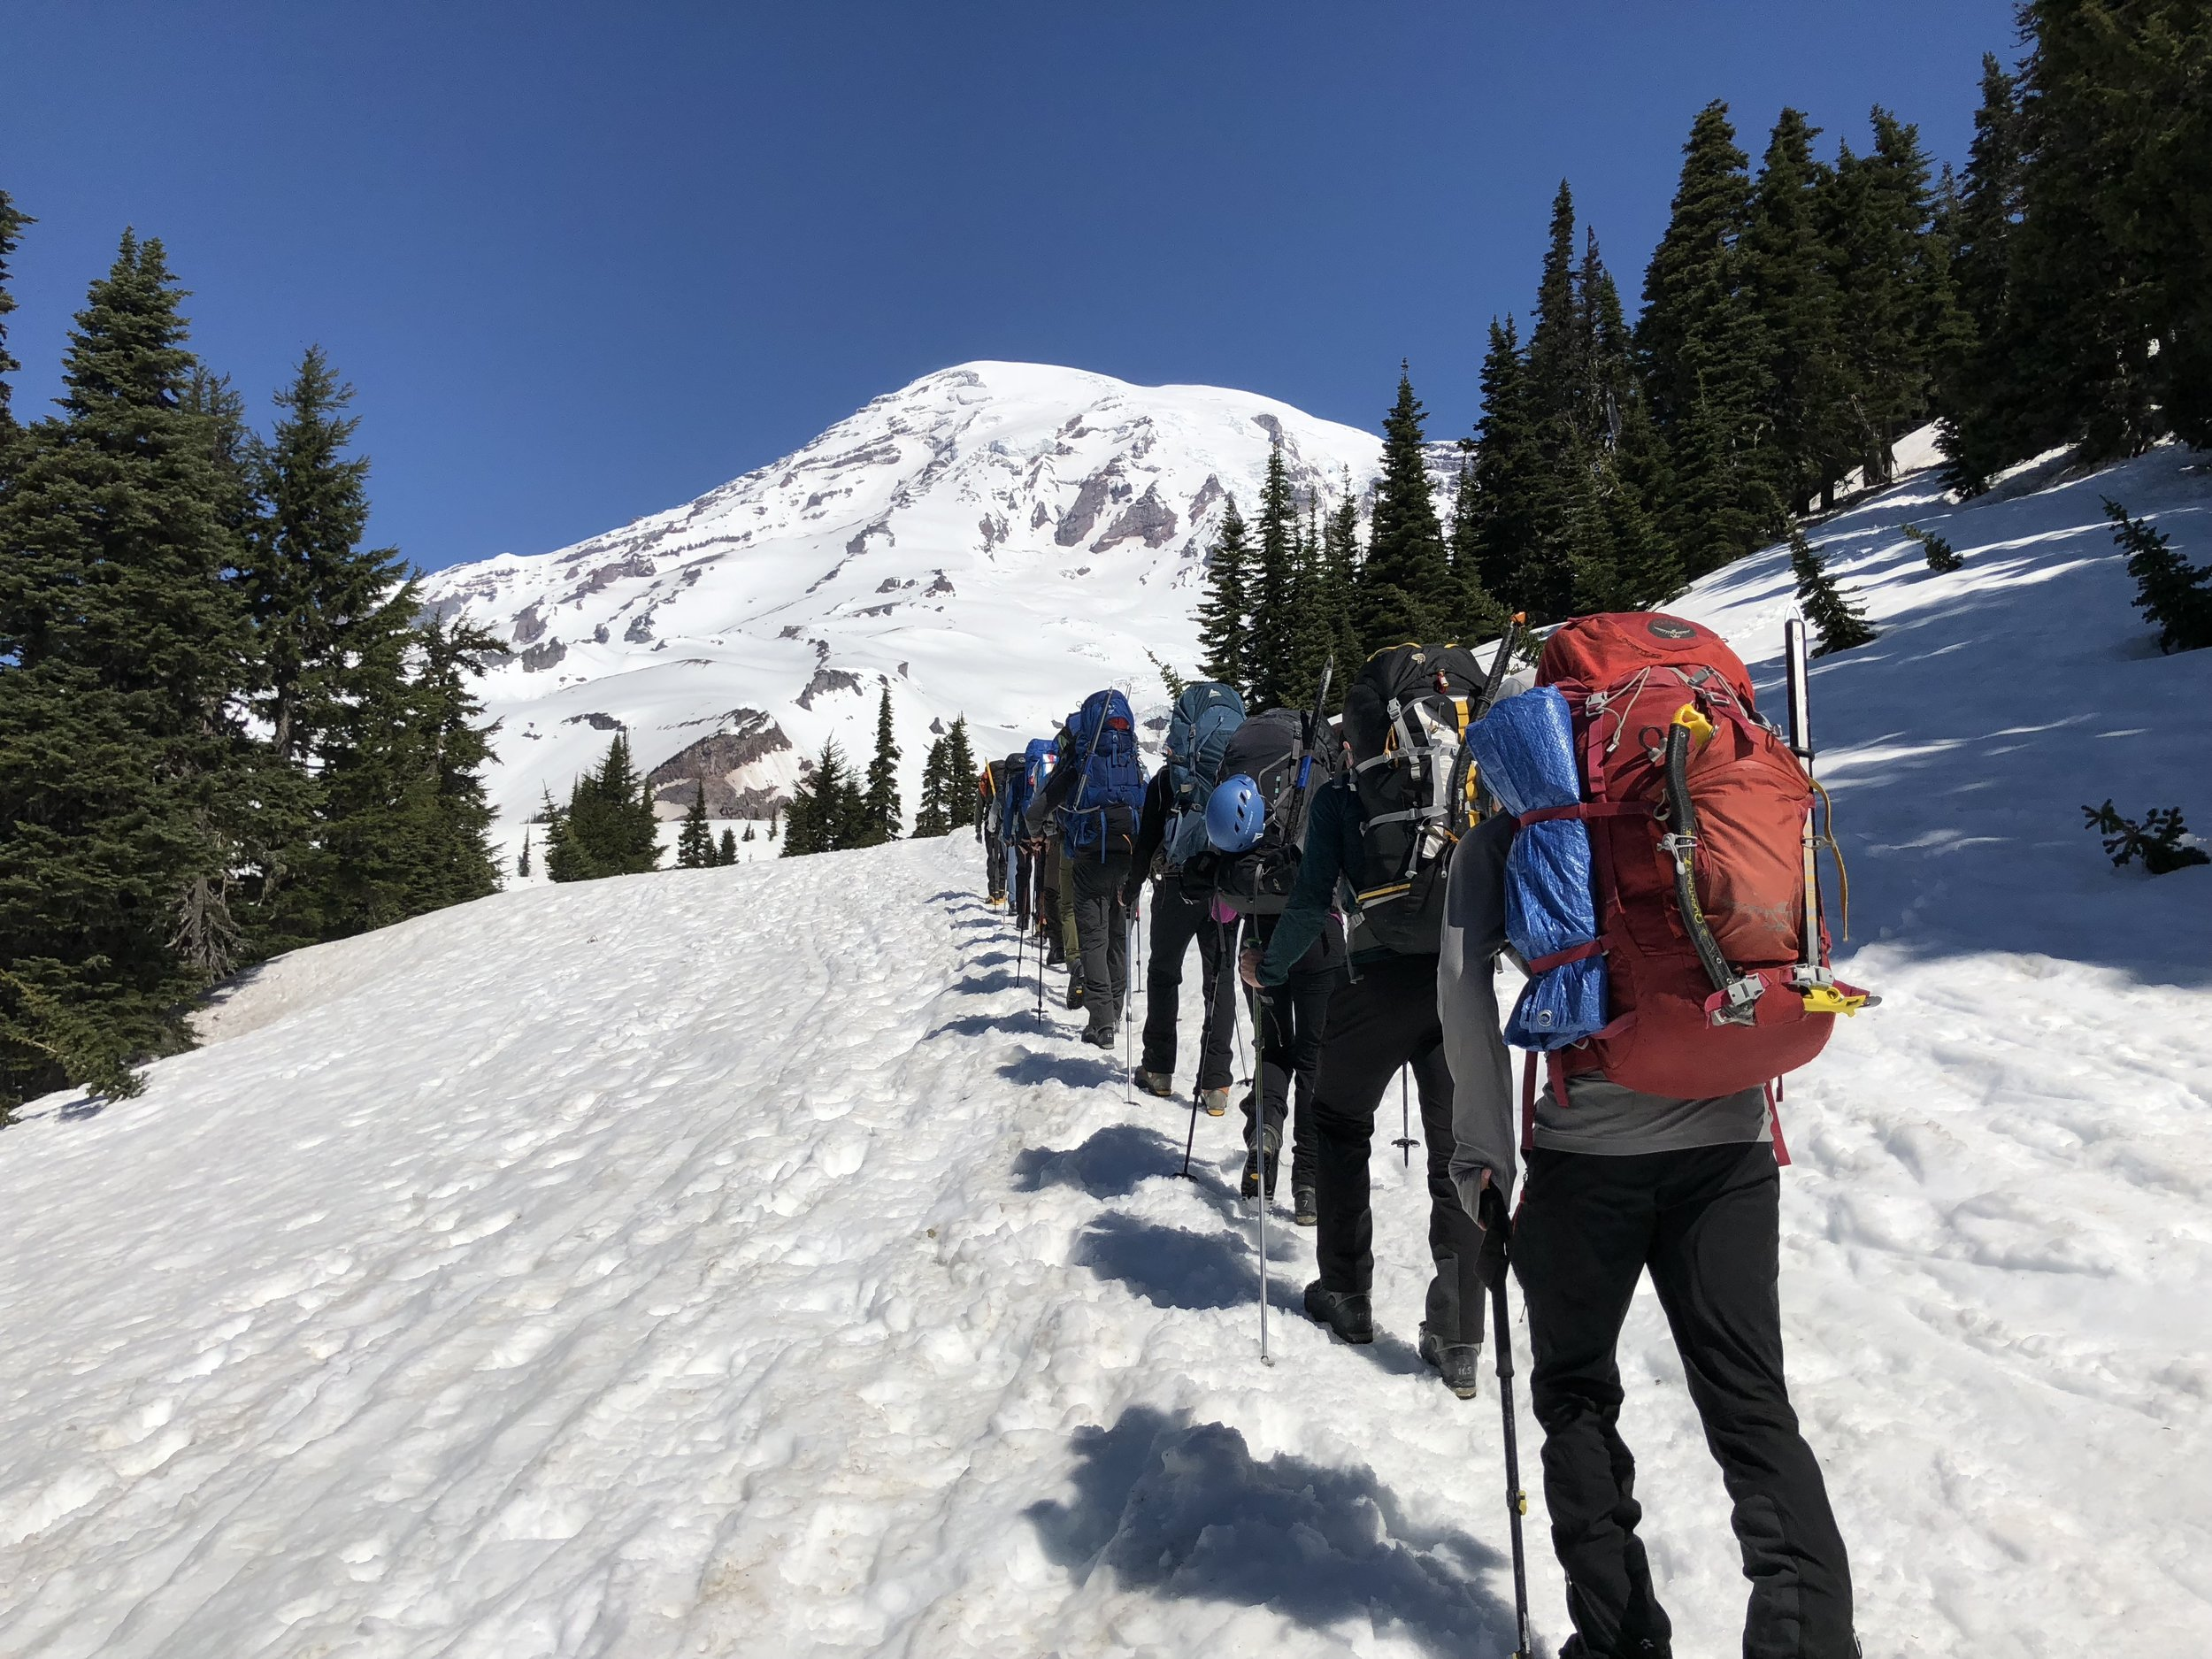 First trip up Rainier